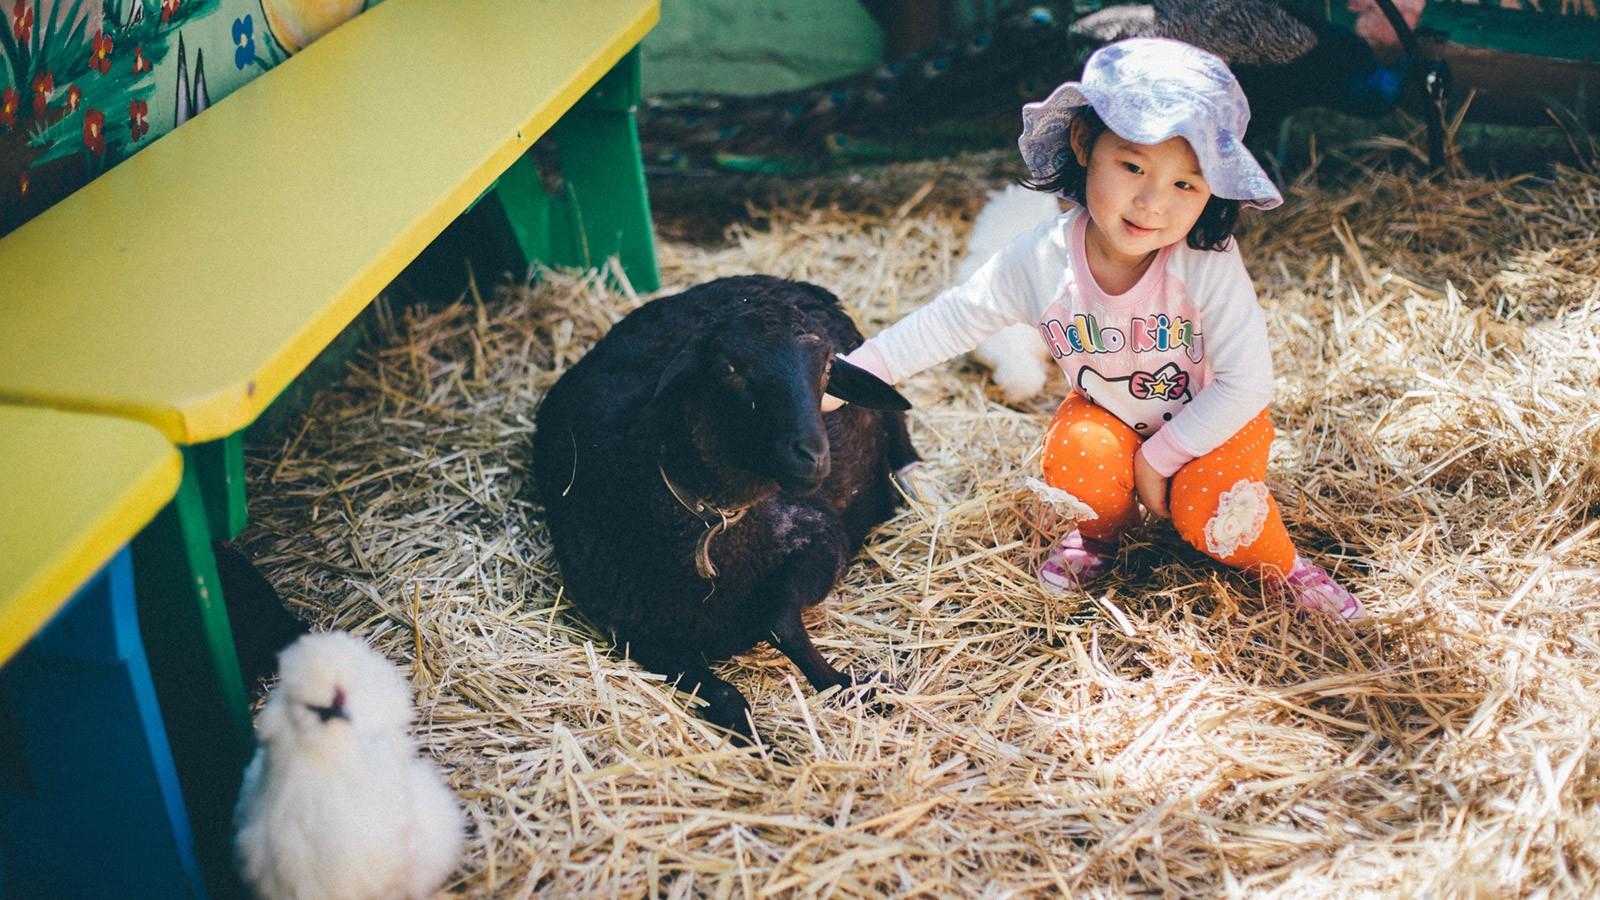 Bugz Playpark | Park & Rides | Petting Farm